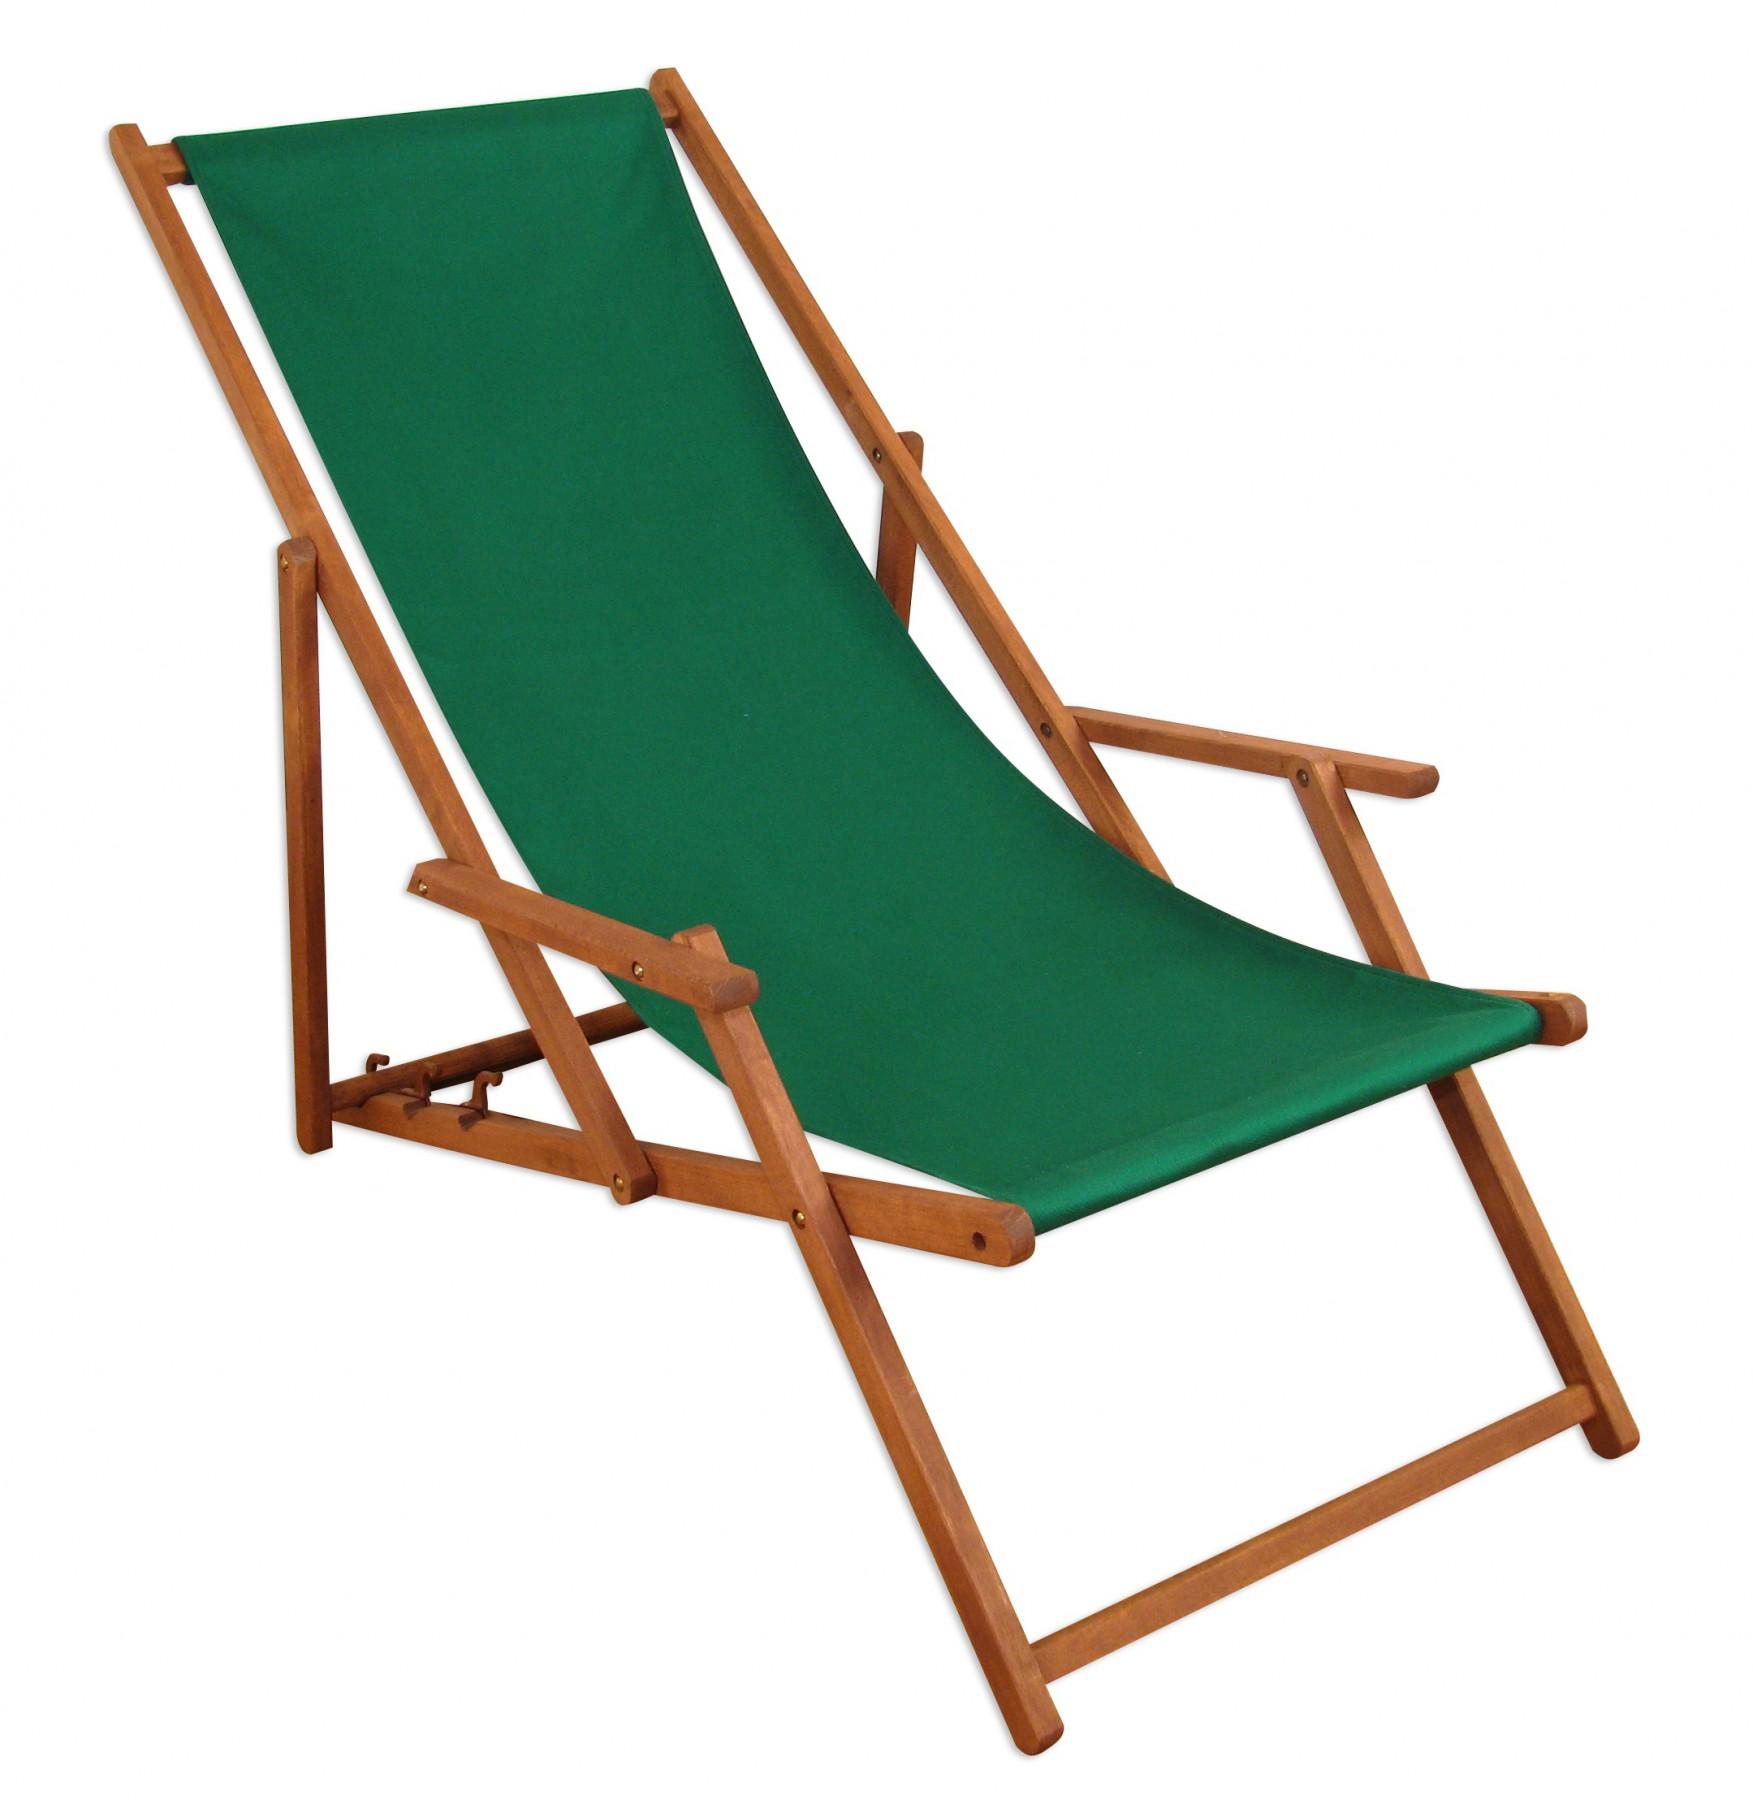 gartenliege gr n deckchair holz liegestuhl fu teil. Black Bedroom Furniture Sets. Home Design Ideas